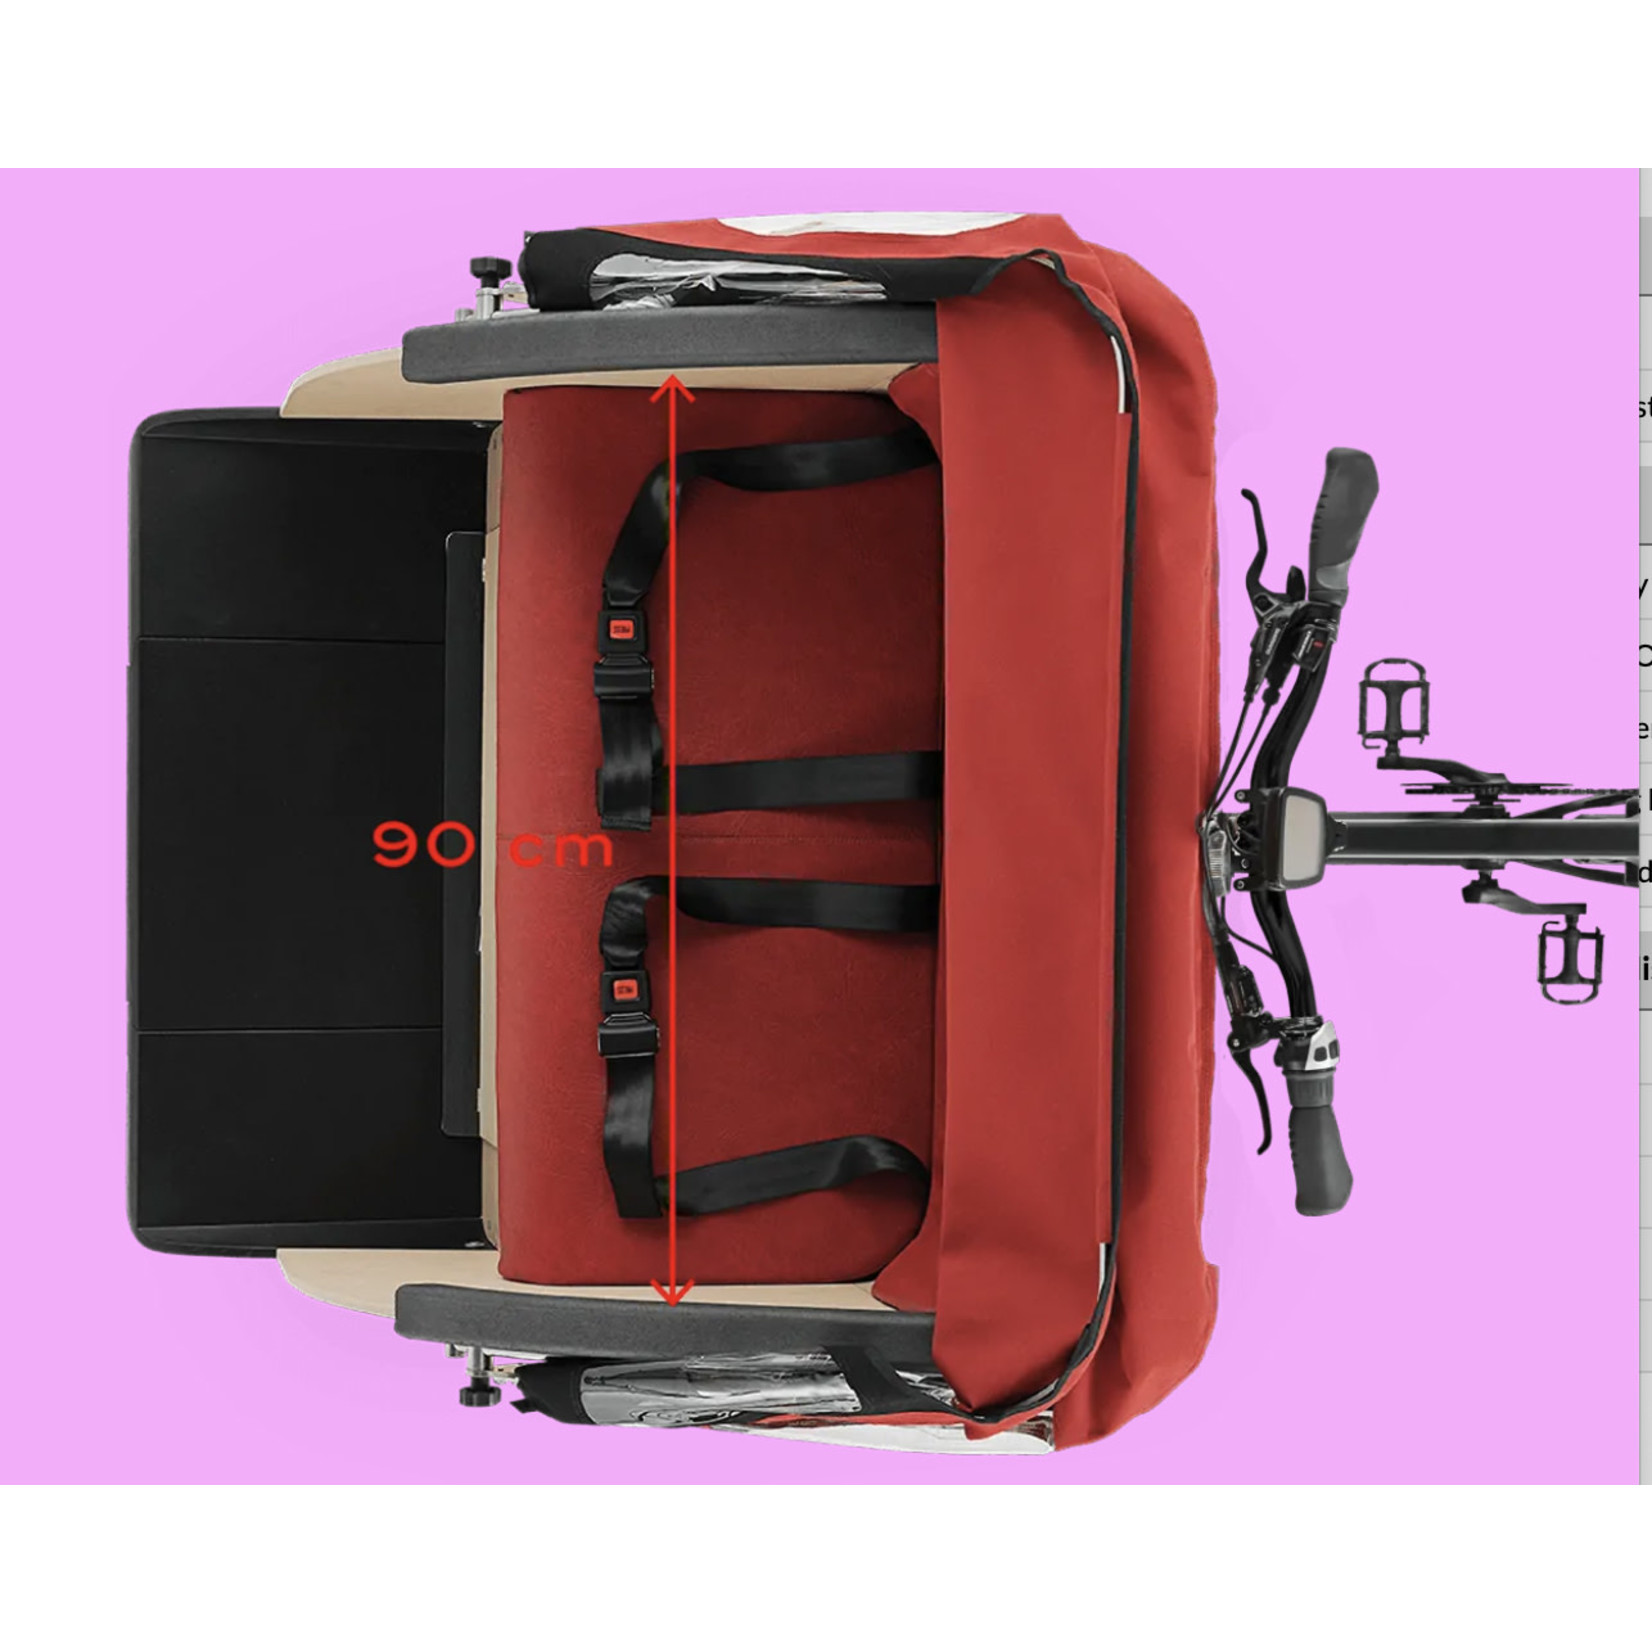 TRIOBIKE Triobike Taxi Mid-Drive Nexus 8